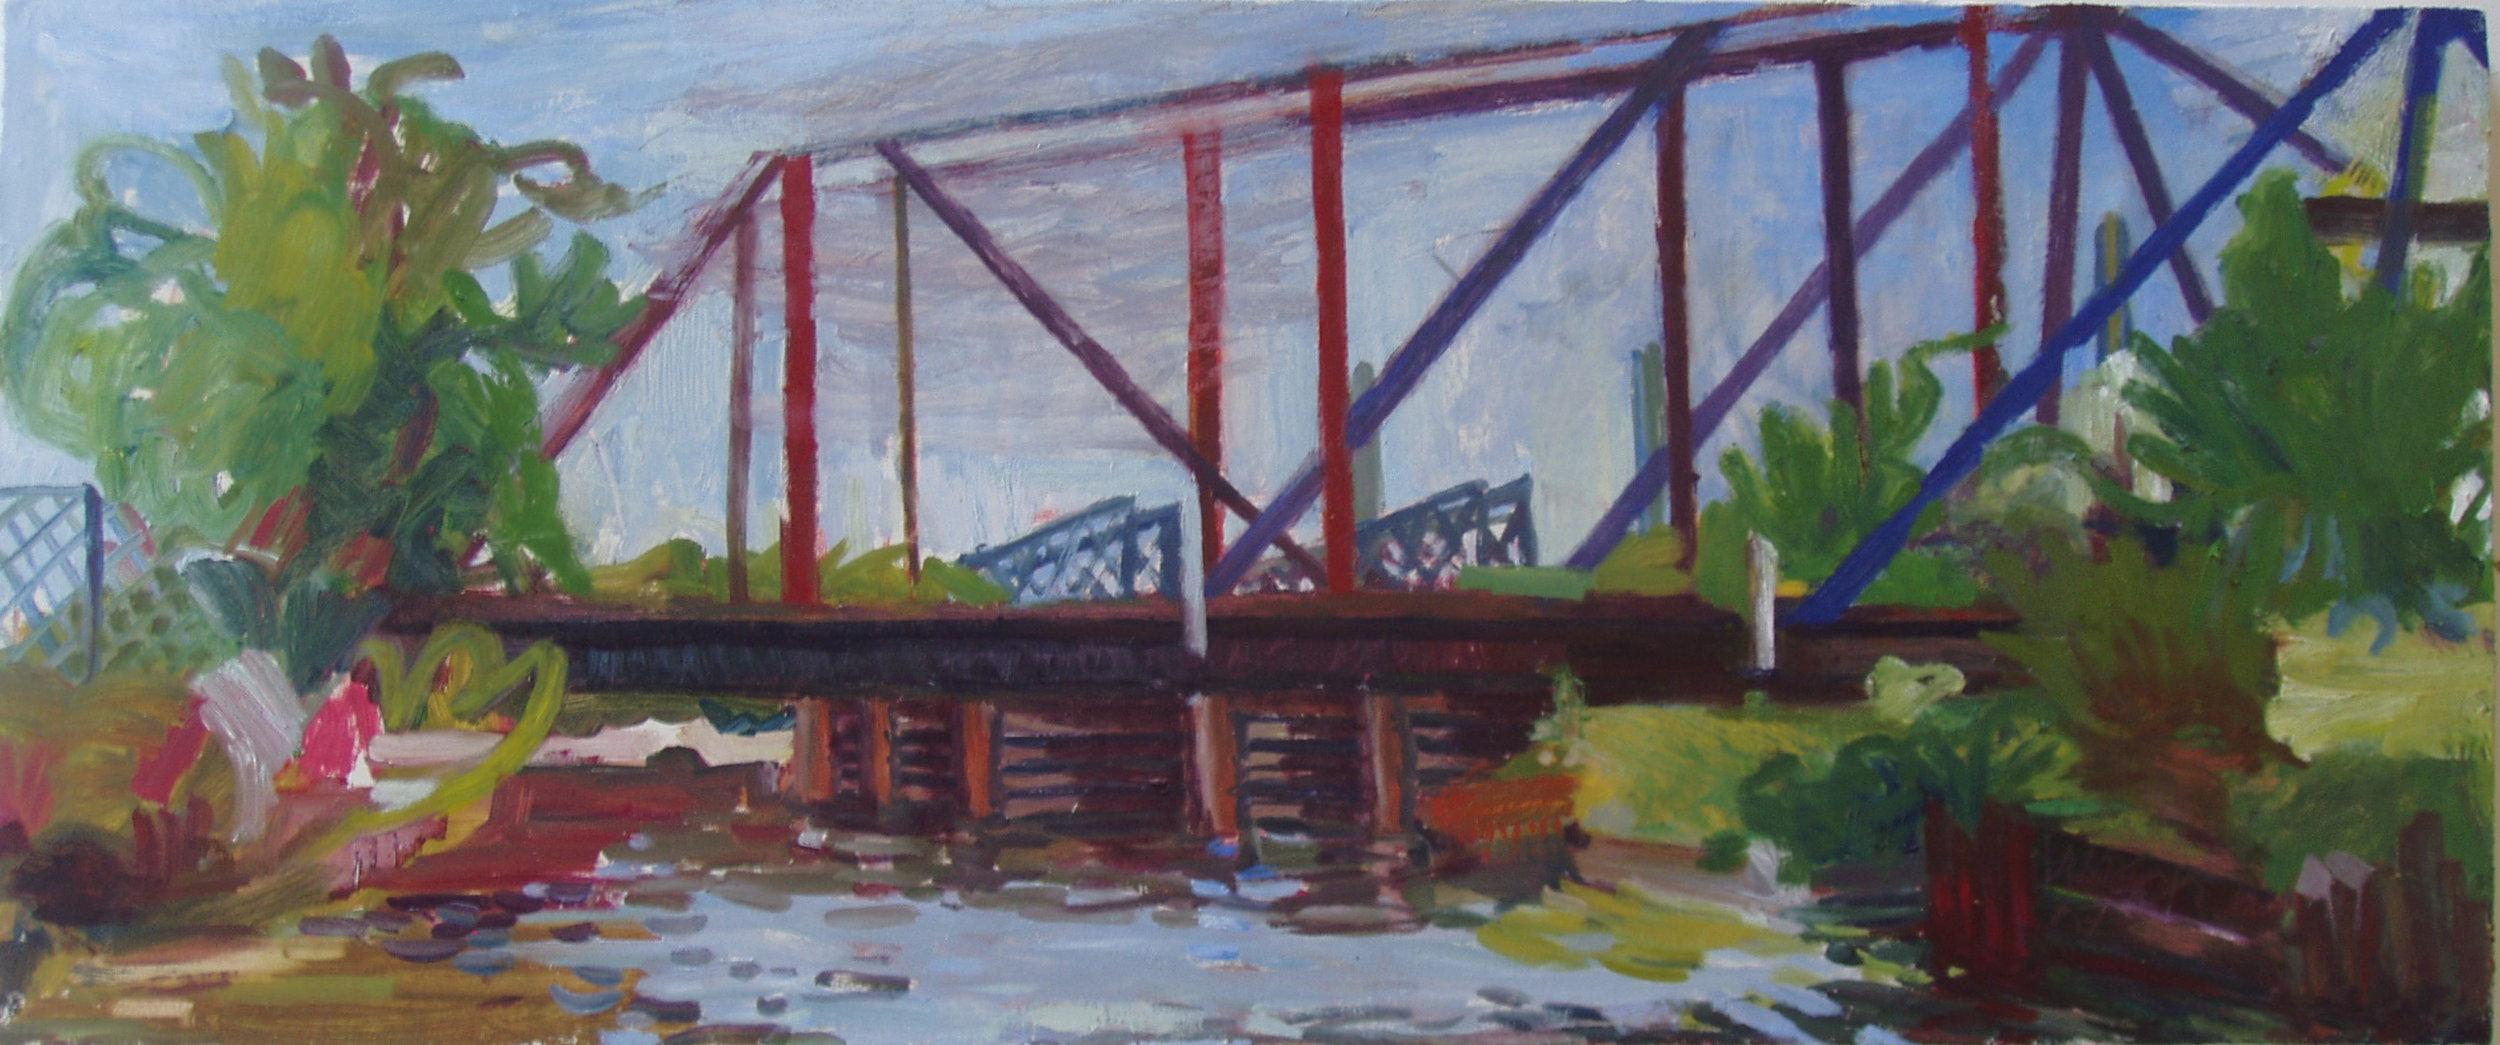 RR Bridge Over Chicago River - North Branch, 2003